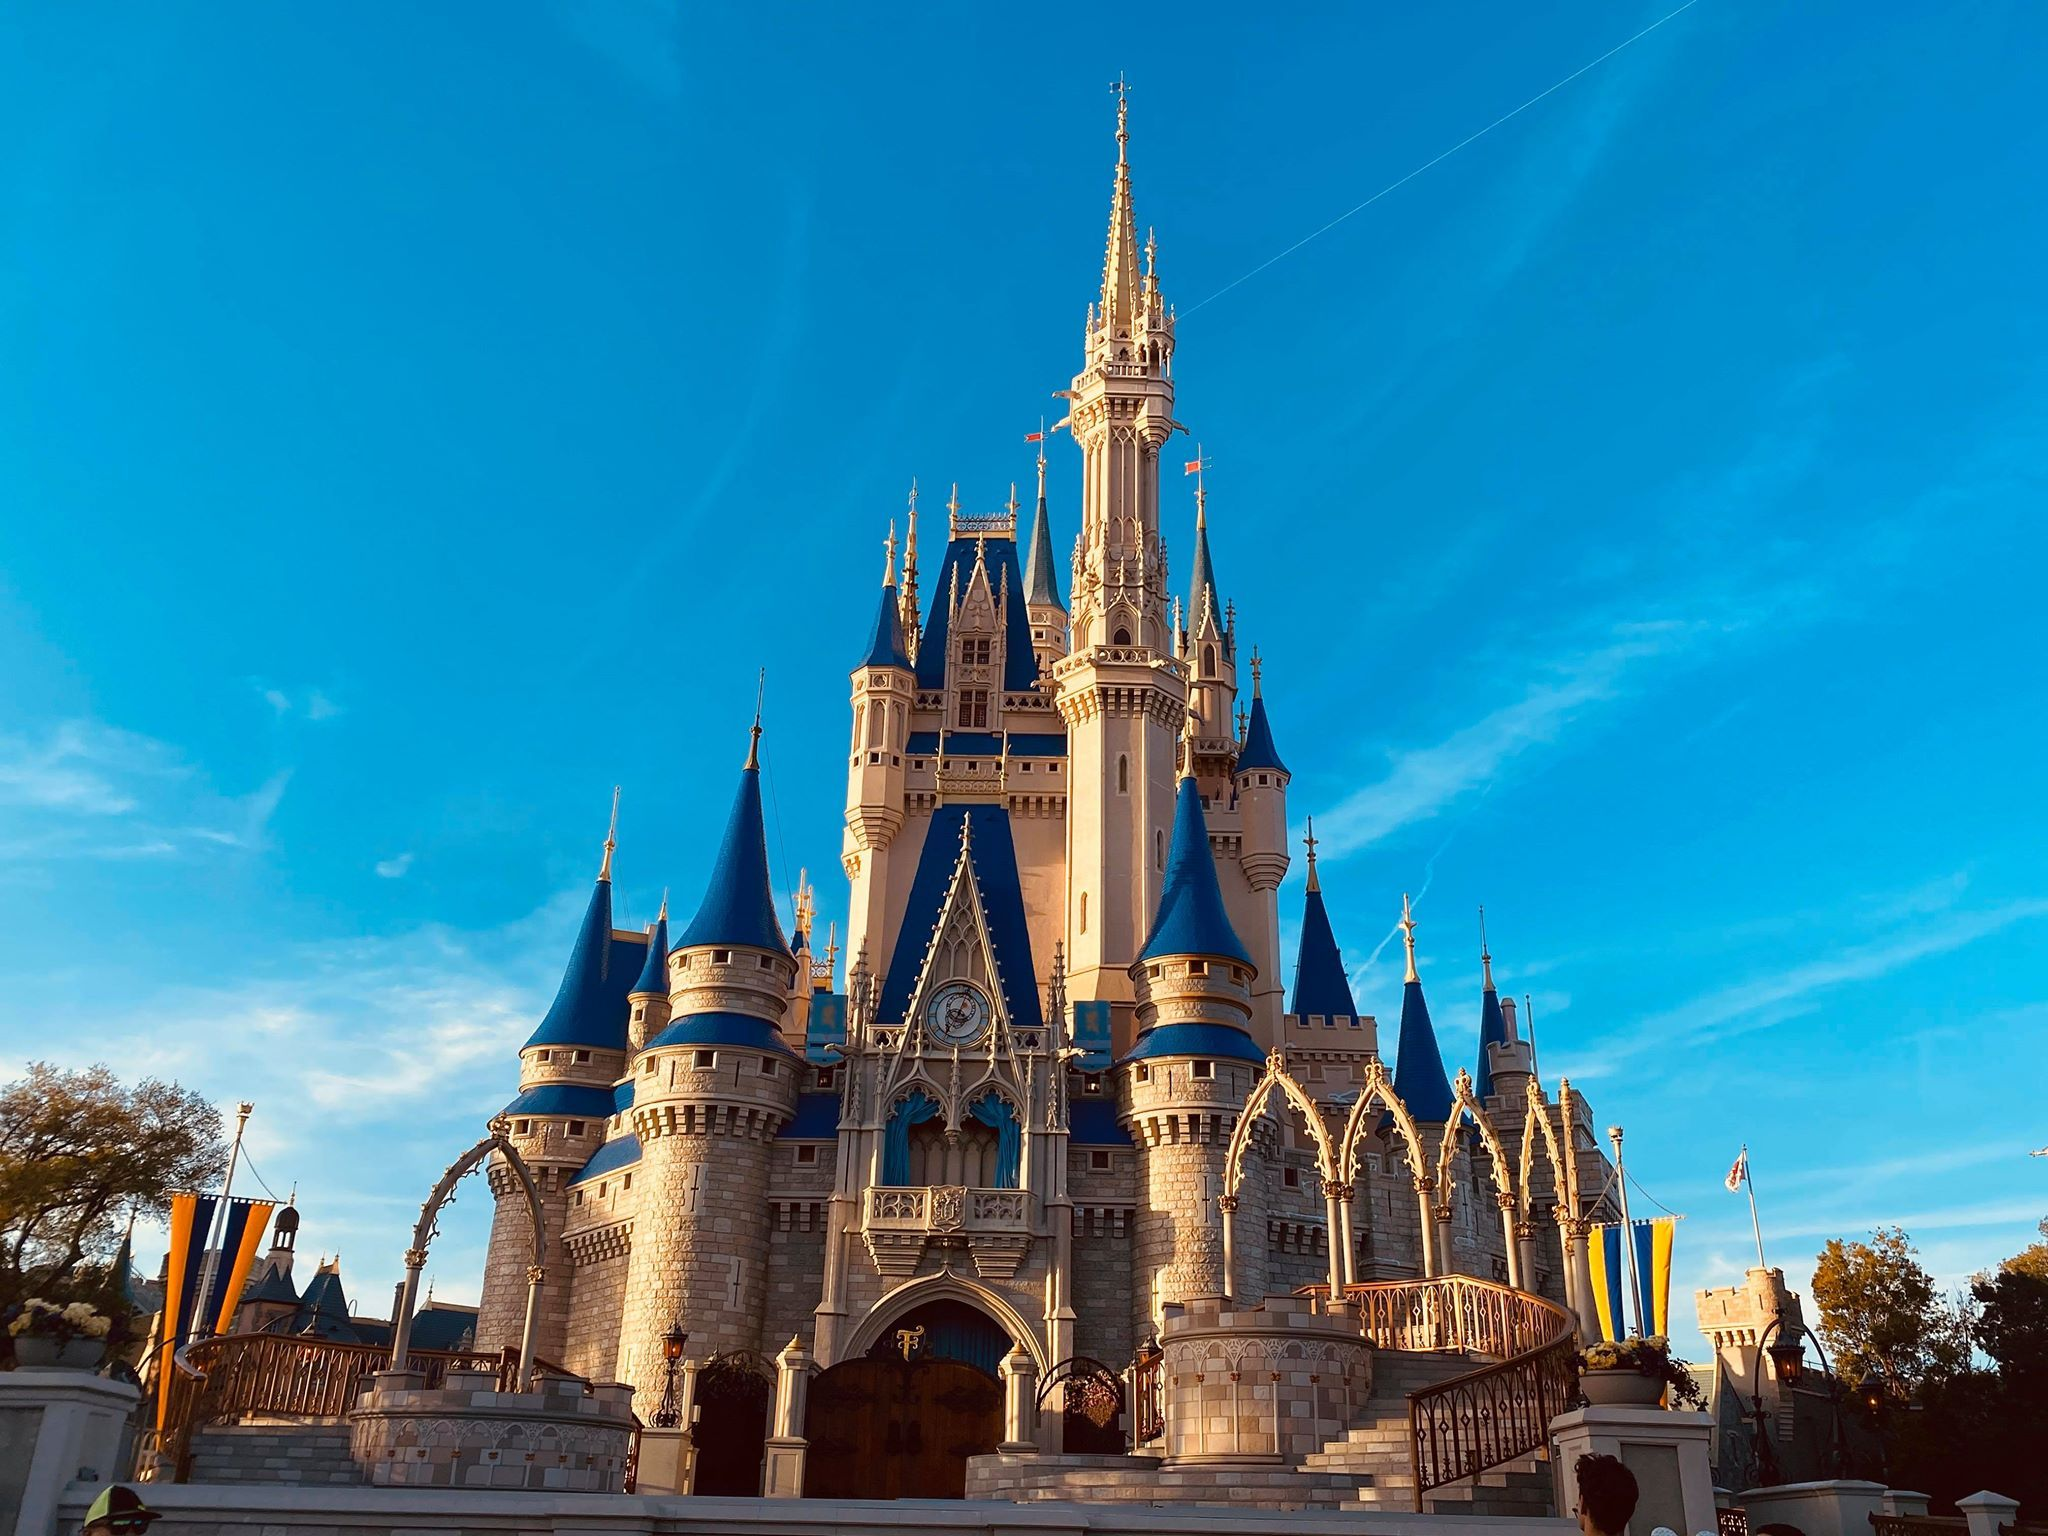 Disney World Cinderella Castle Wallpapers - Wallpaper Cave